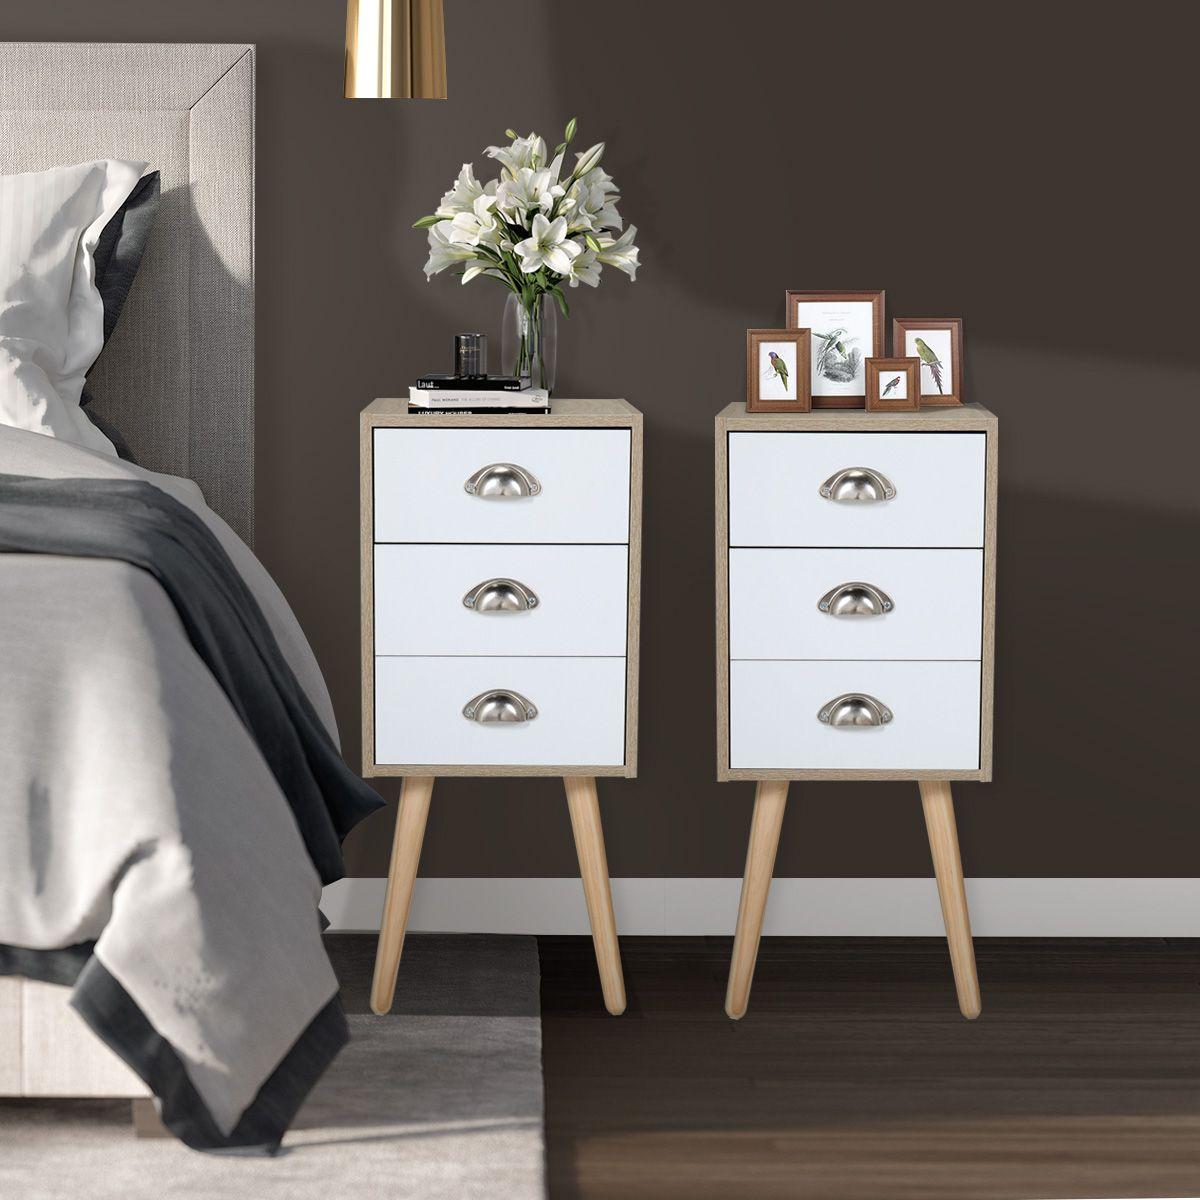 Set Of Two Bedside End Table For Bedroom For Sale Bedroom Night Stands Modern Bedside Table Style Nightstand Set of two night stands